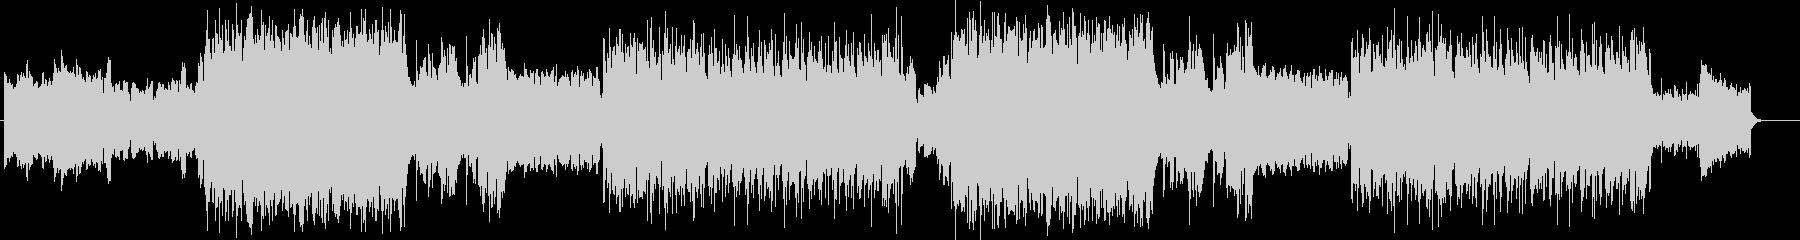 「HR/HM」「DEATH」BGM327の未再生の波形